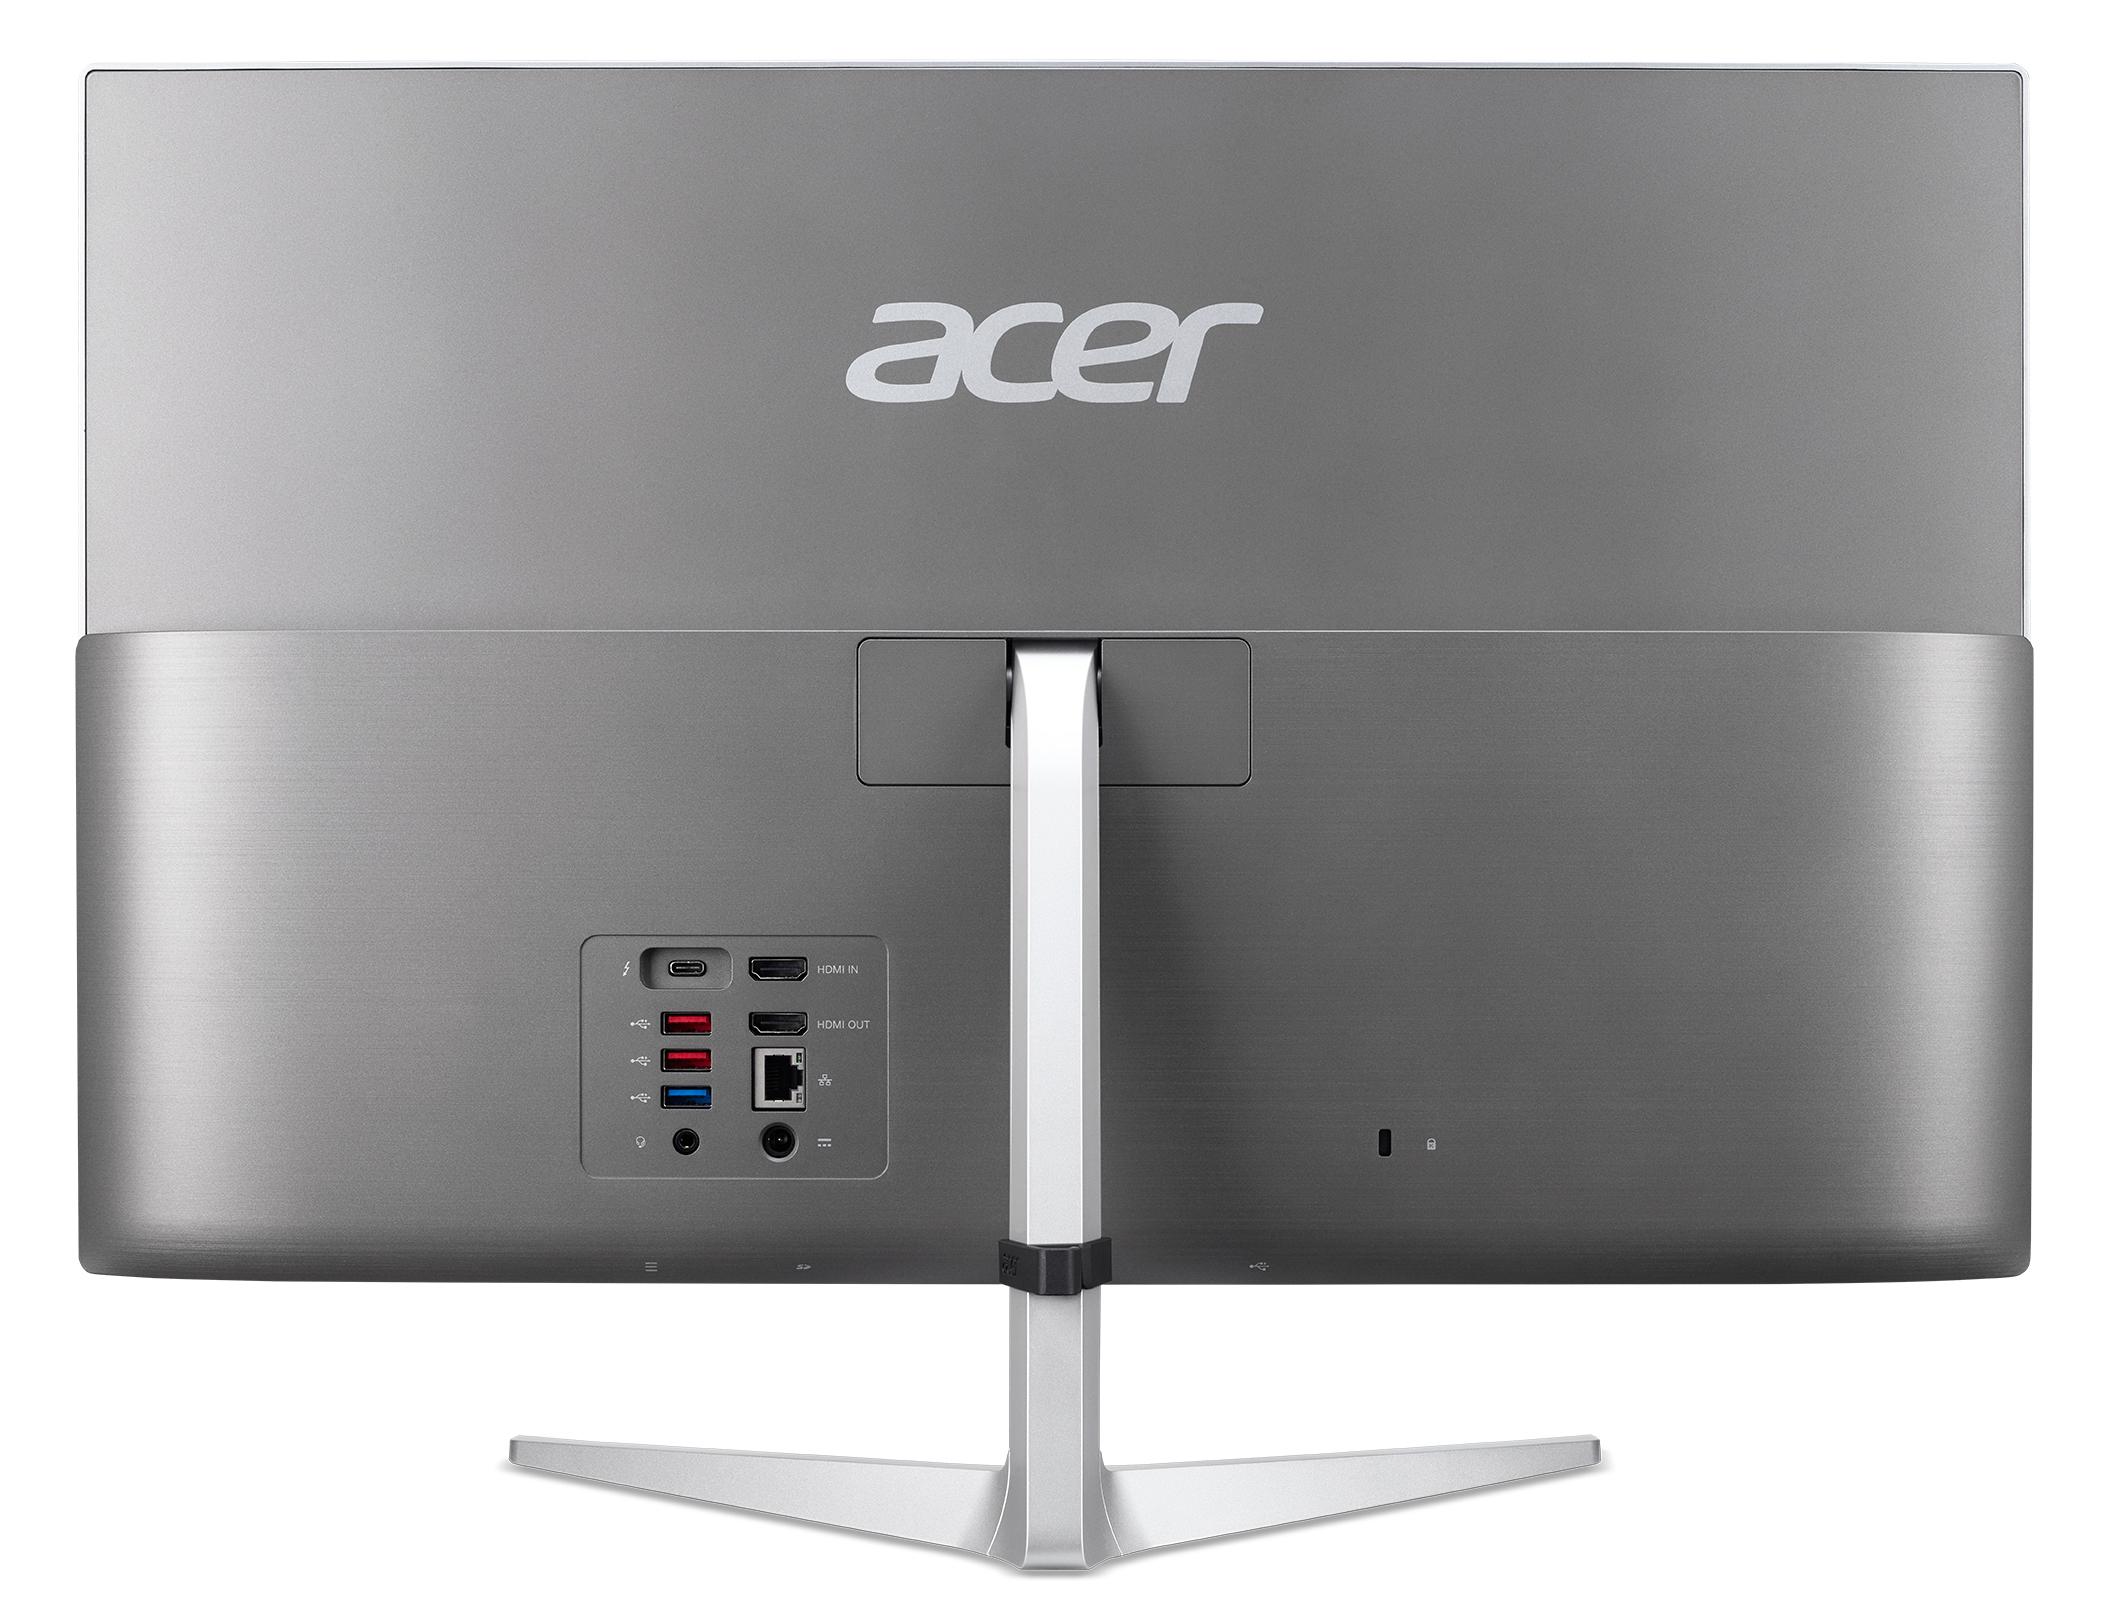 Acer Aspire C24-1650 I5520 NL, 23.8i FHD IPS, i5-1135G7, 8GB DDR4, 256GB PCIe NVMe SSD + 1TB HDD, IrisXe Graphics, QWERTY - Windows 10 Home